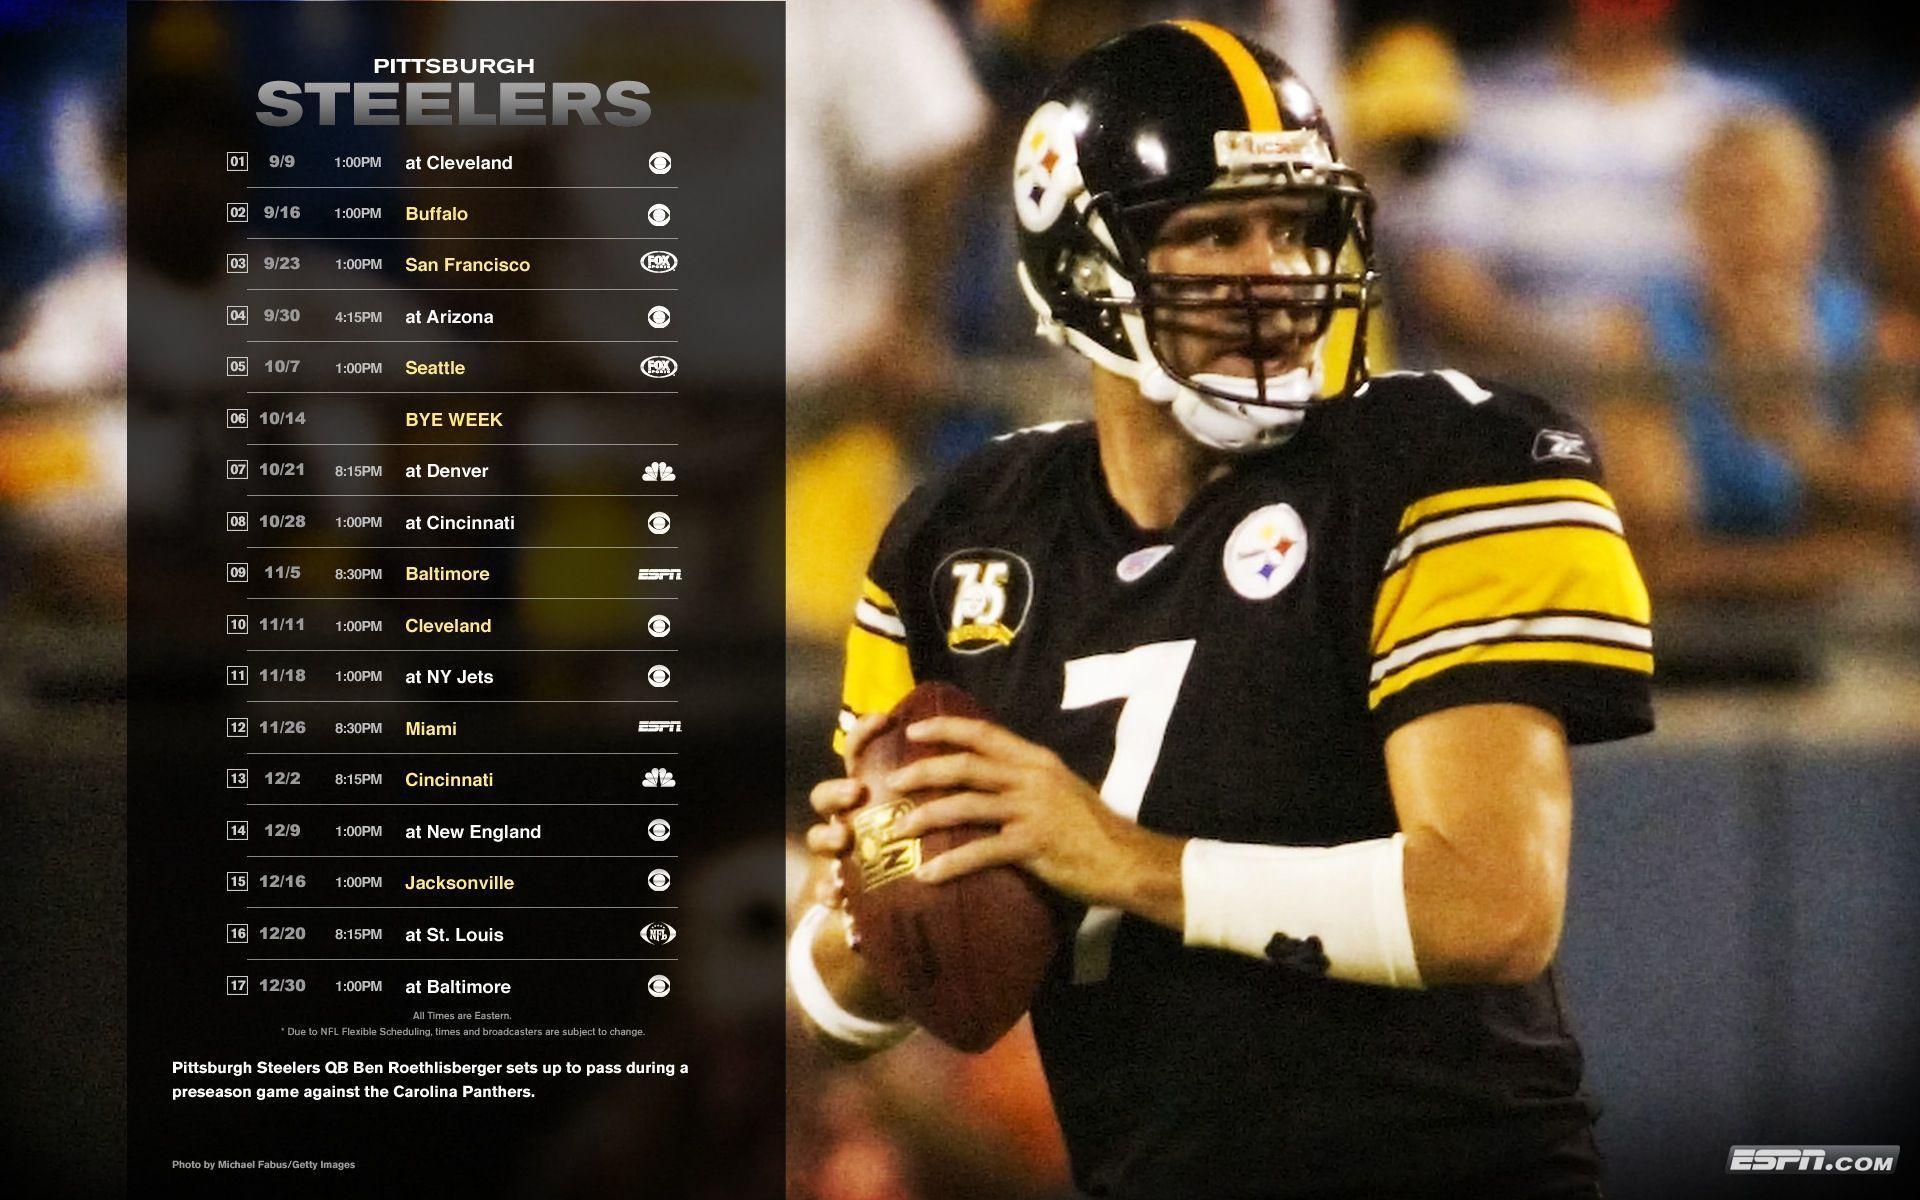 Steelers HD Wallpapers Group (82+)